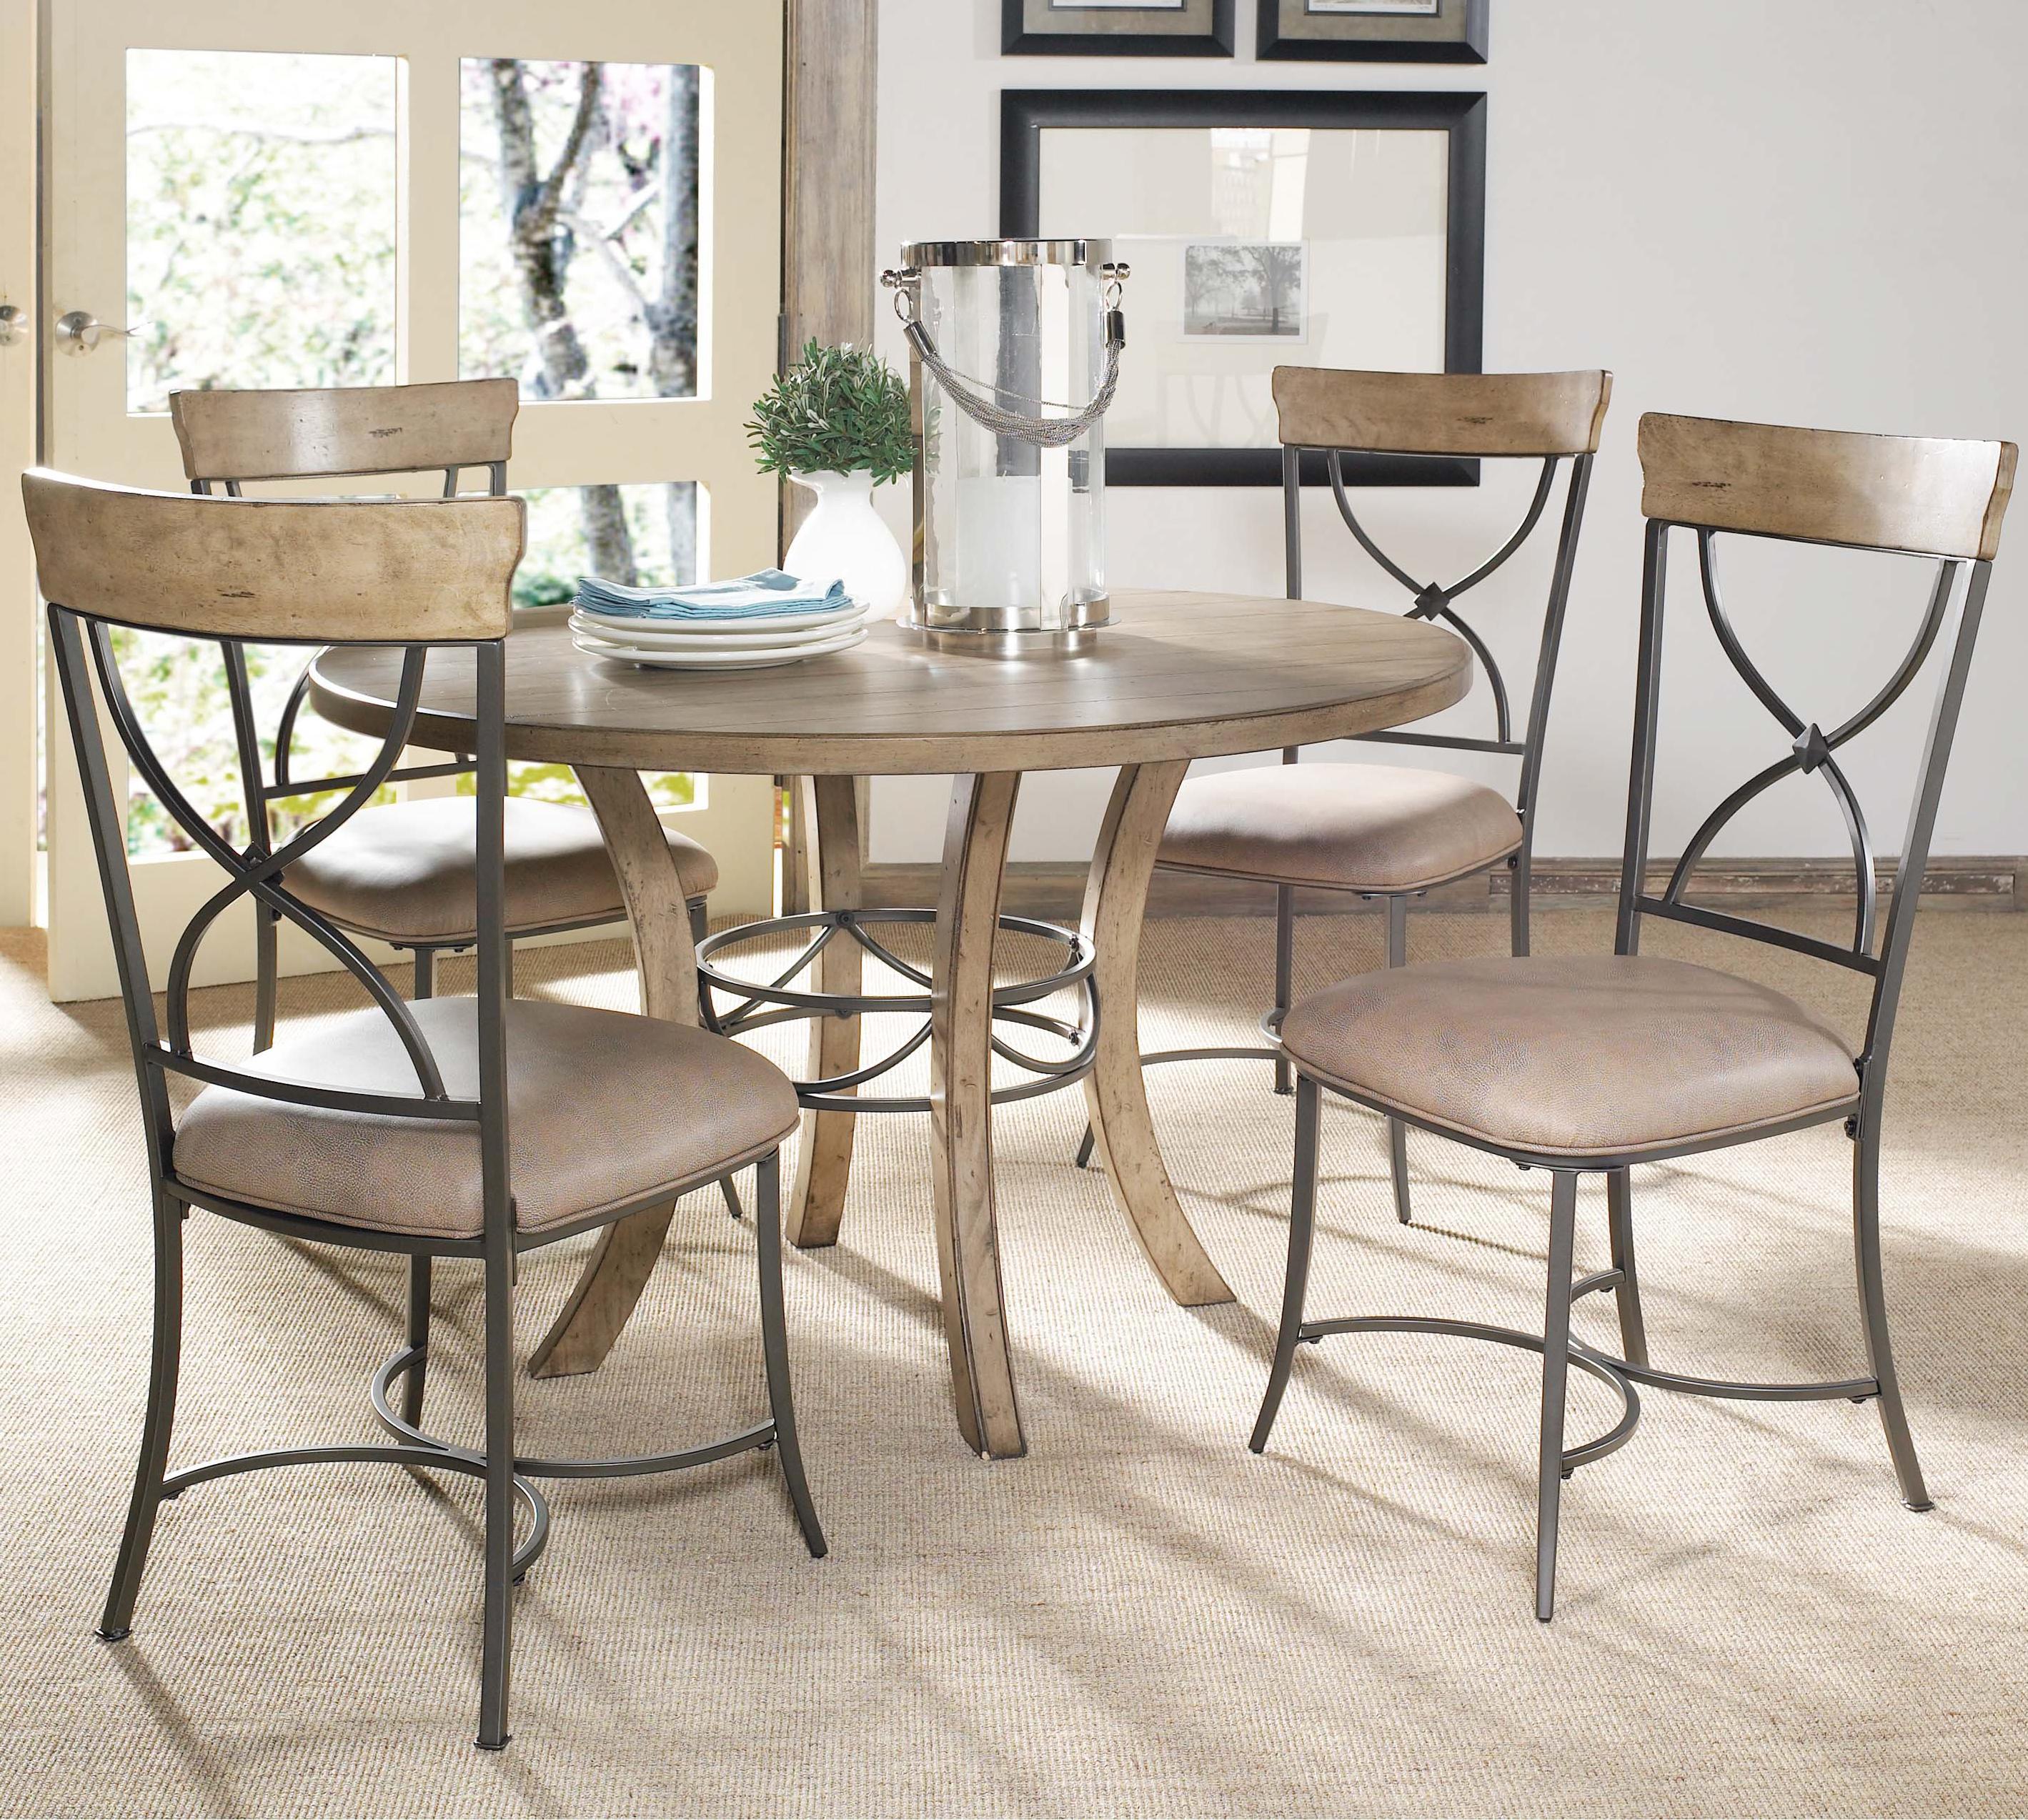 Hillsdale Charleston 5 Piece Dining Set - Item Number: 4670DTBW+2x802